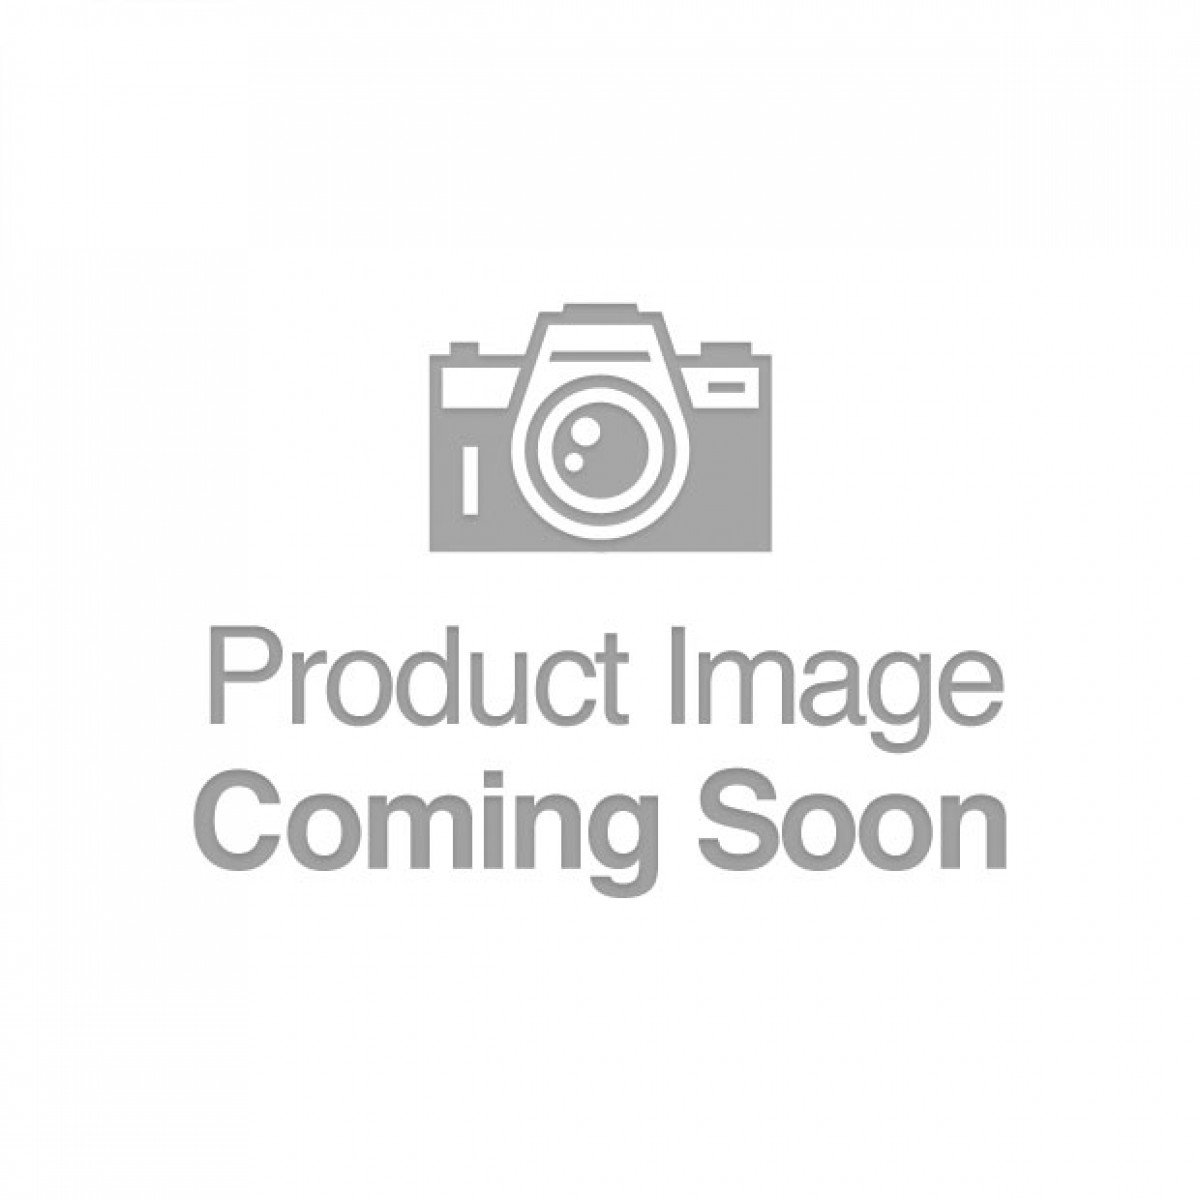 Master Series Triple Spades Anal Plug Set - 3 pc